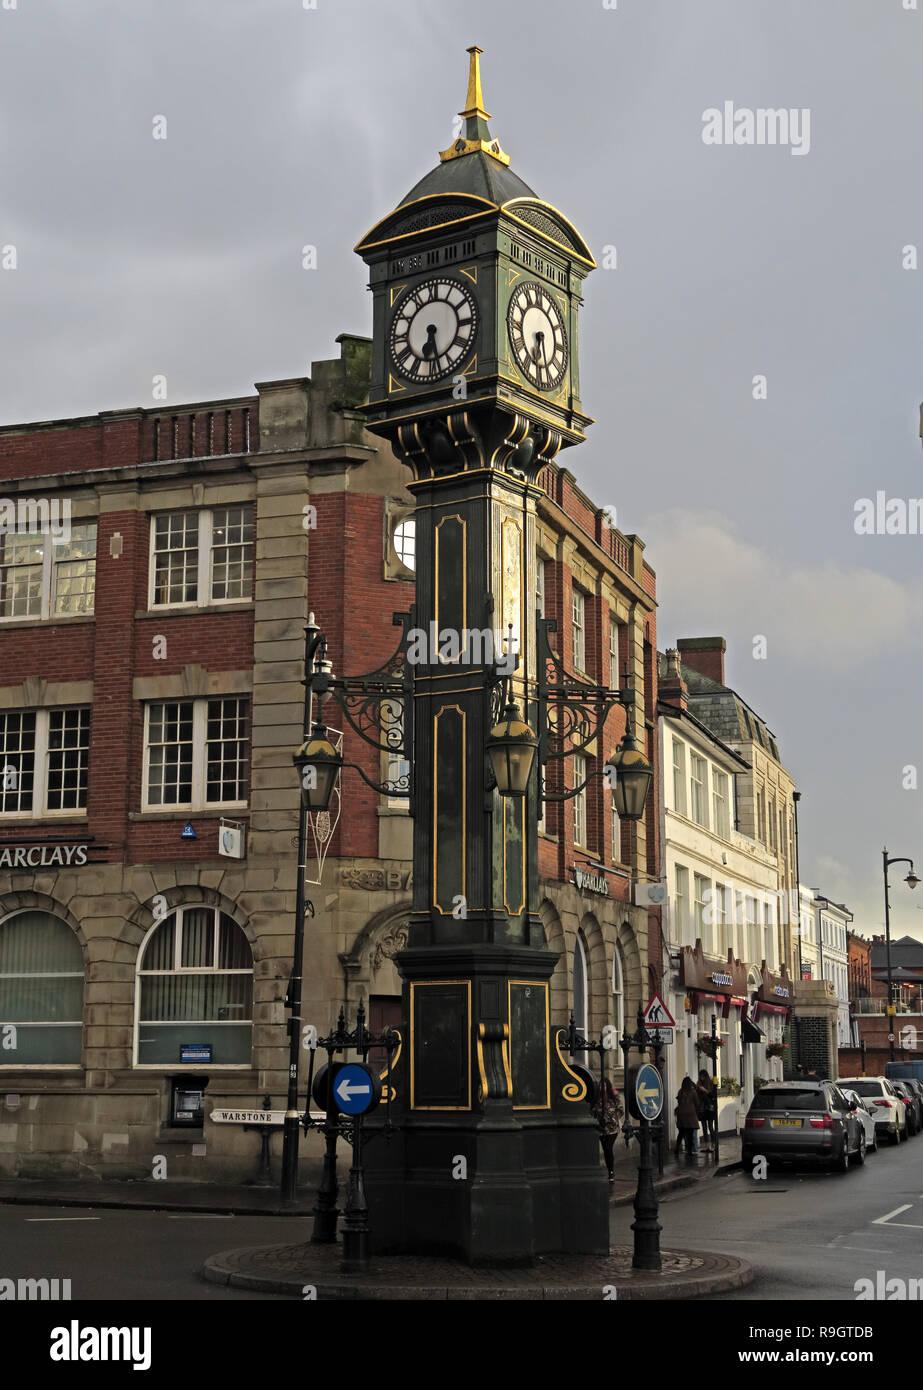 Chamberlain Clock, Edwardian, cast-iron, clock tower, Jewellery Quarter, Birmingham, West Midlands, England, UK, - Stock Image